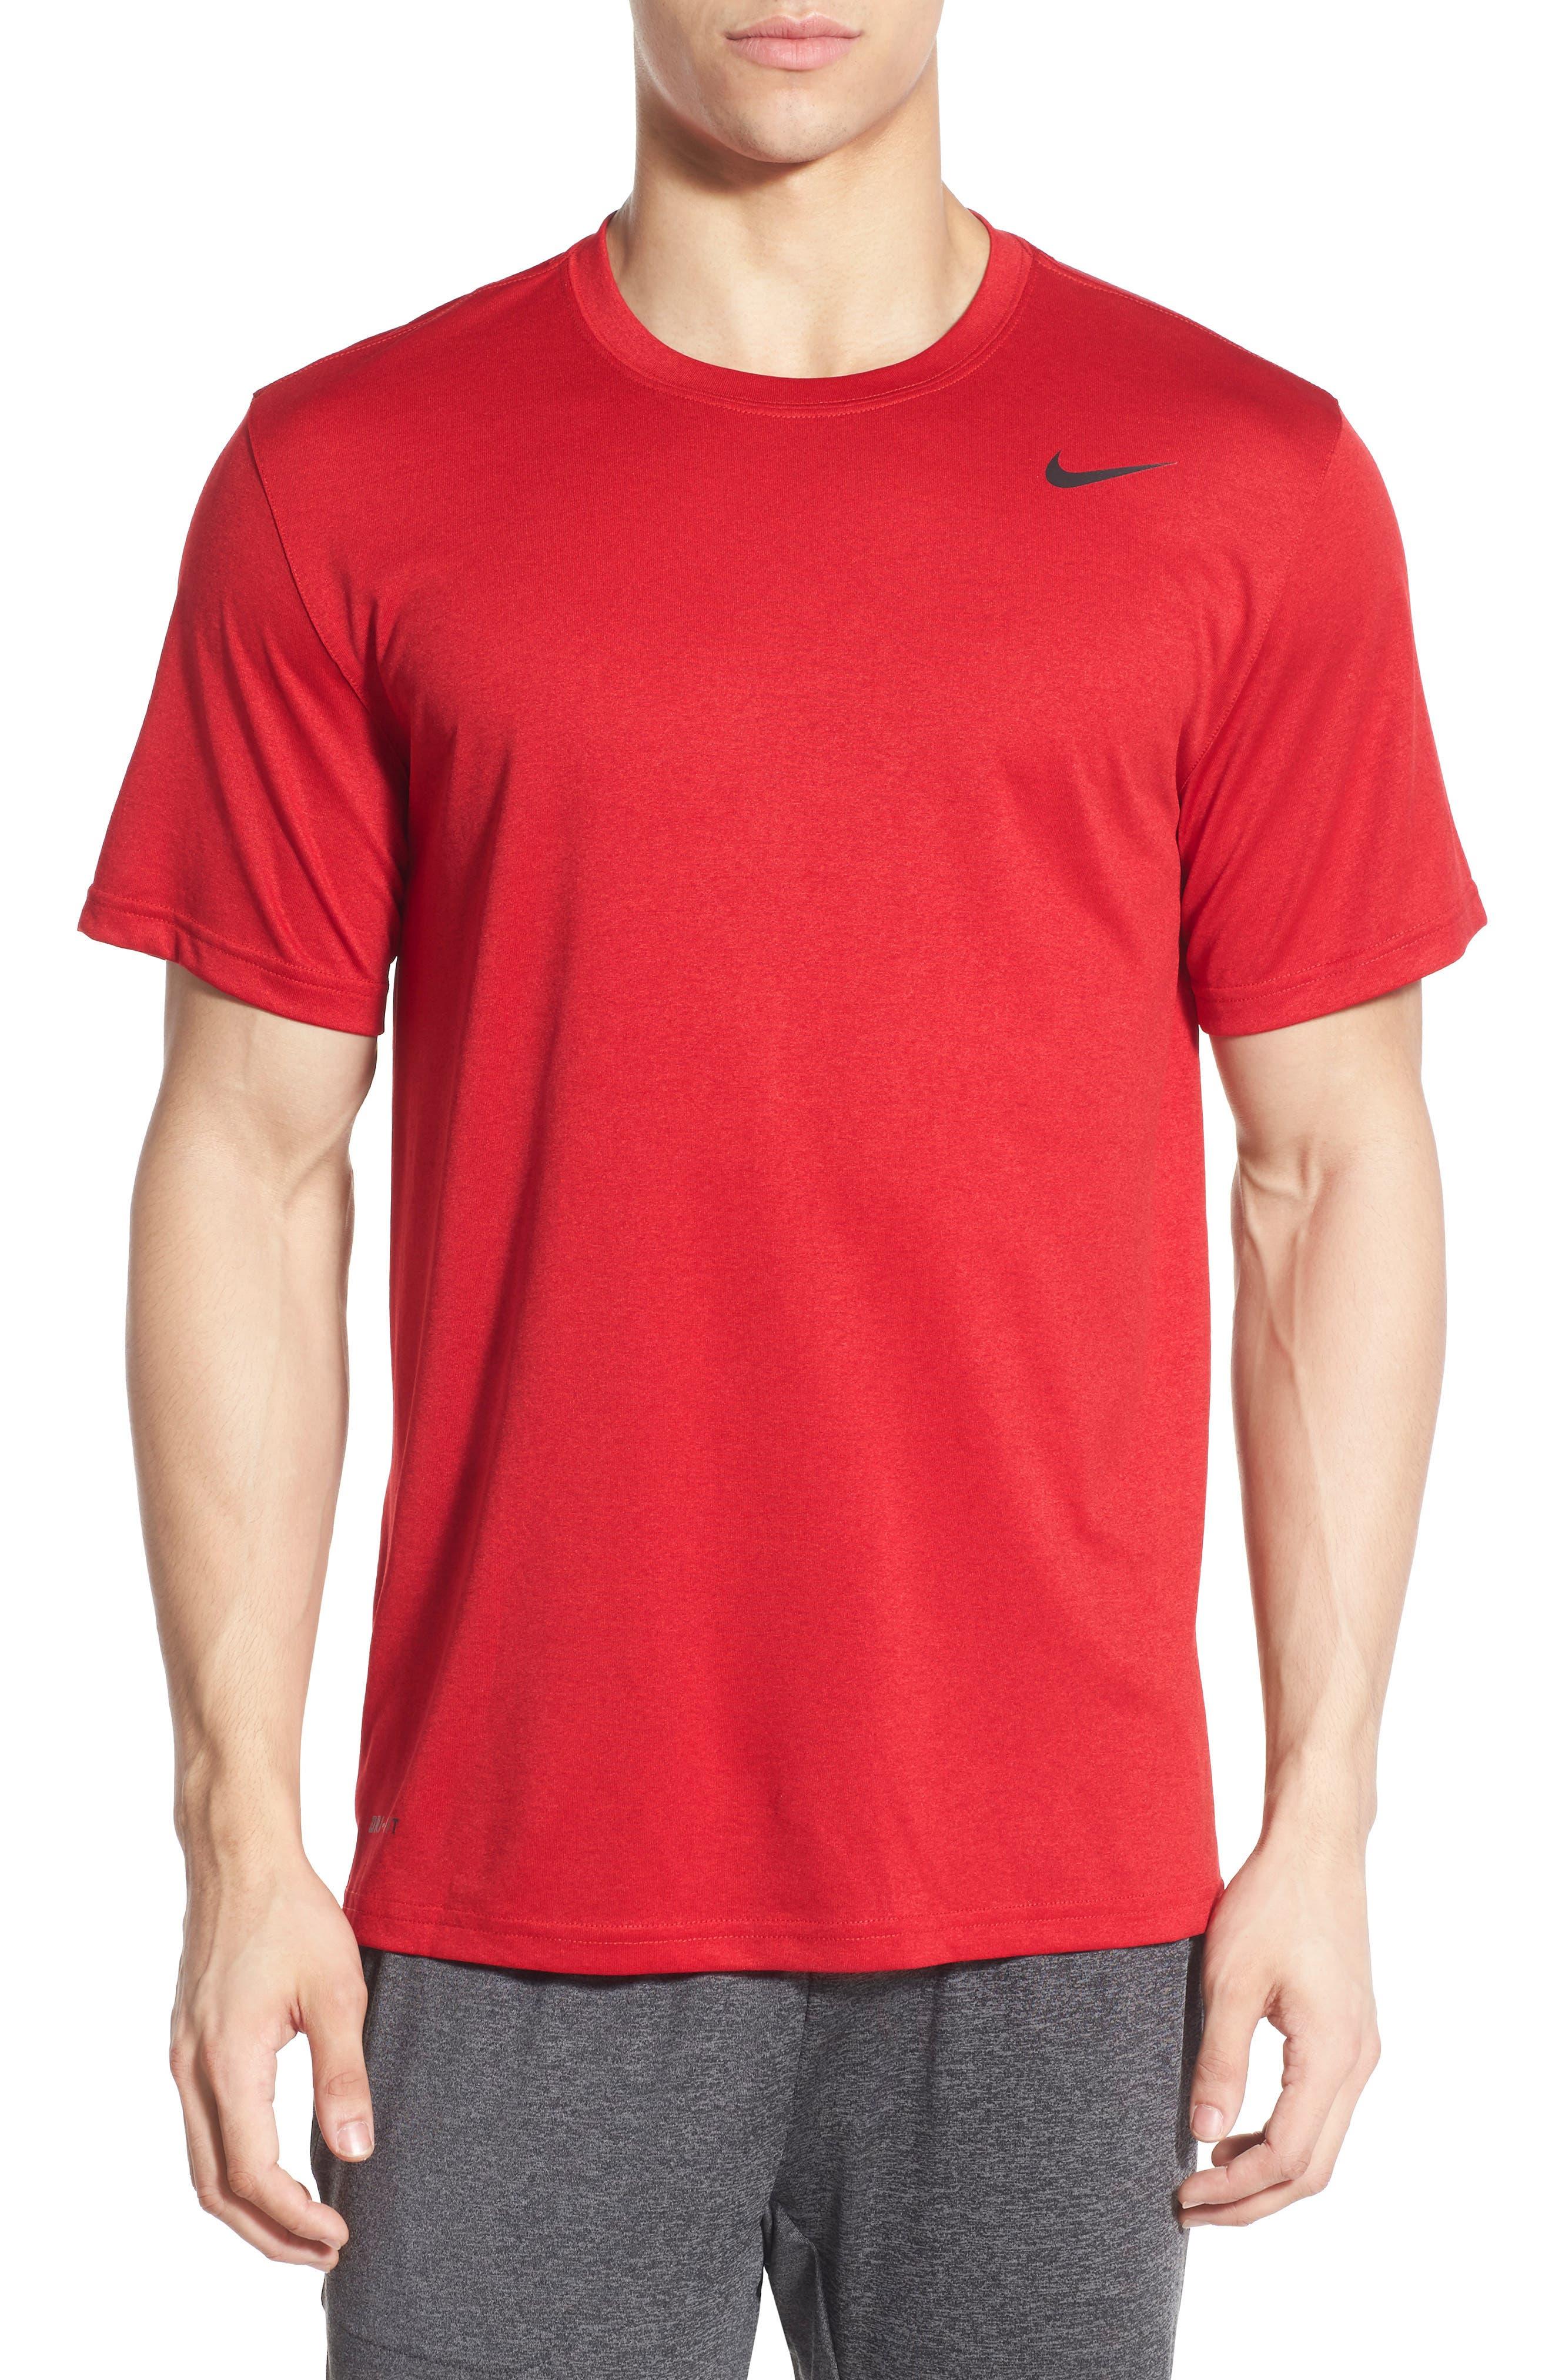 Nike Legend 2.0 Dri-FIT Graphic T-Shirt (Regular Retail Price: $25.00)